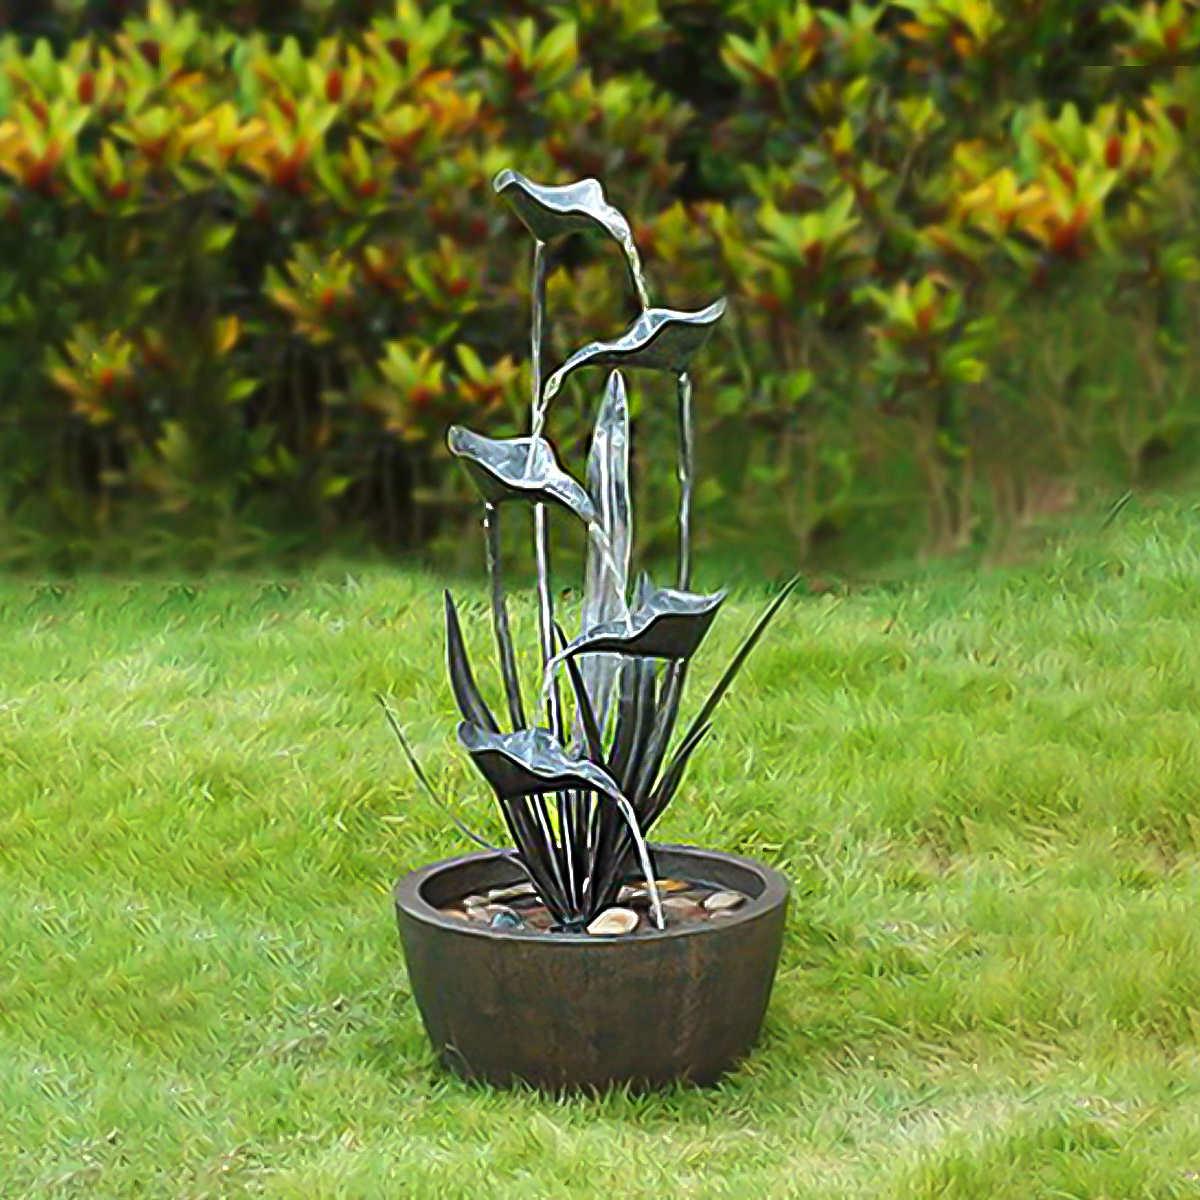 Water fountains calgary - Cascading Metal Leaf Garden Fountain 86 4 Cm 34 In